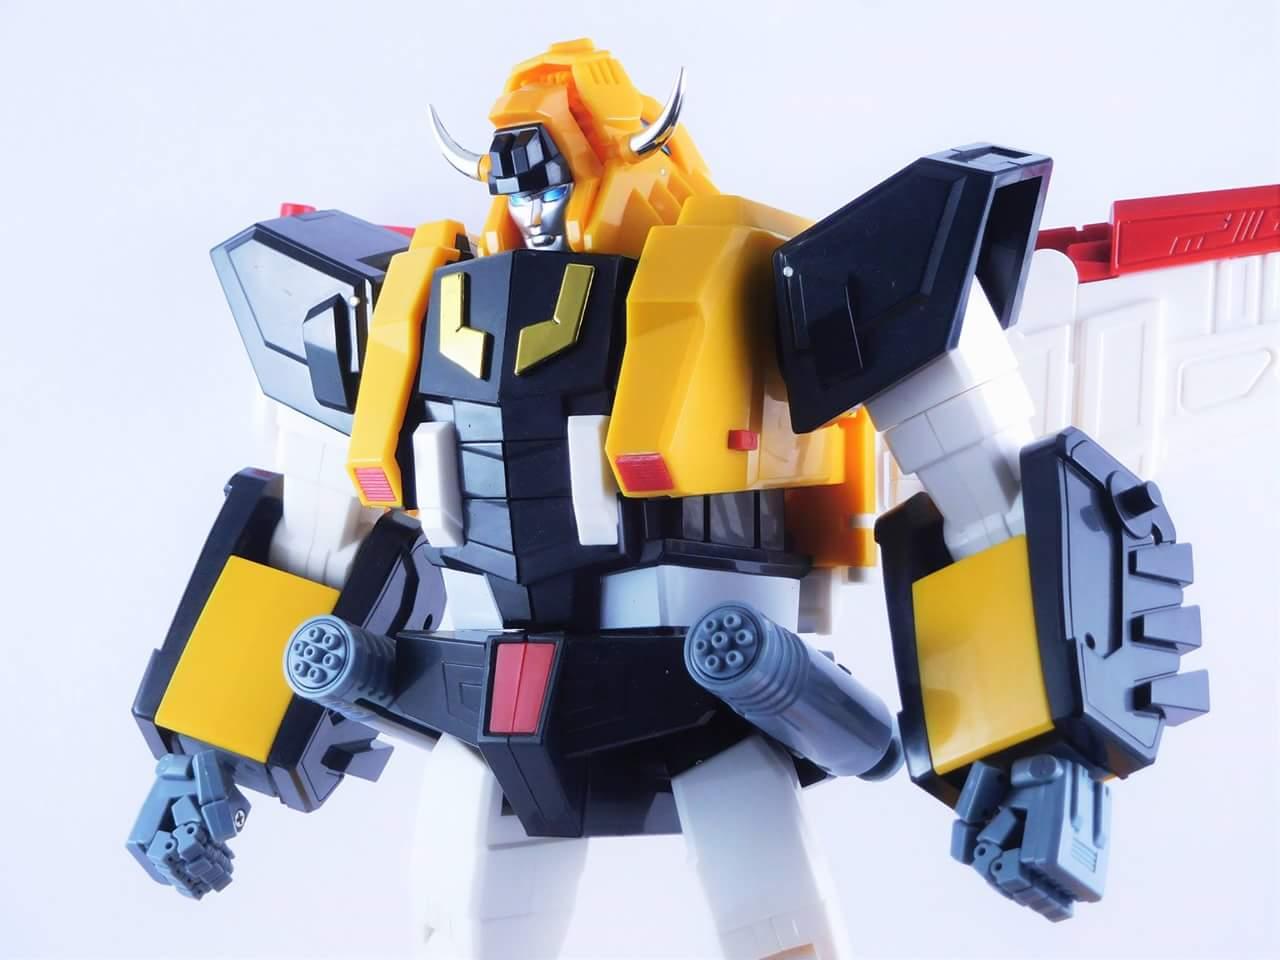 [KFC Toys] Produit Tiers - Jouet Phase 8-A Simba - aka Victory Leo (Transformers Victory) - Page 2 V1Wln4rr